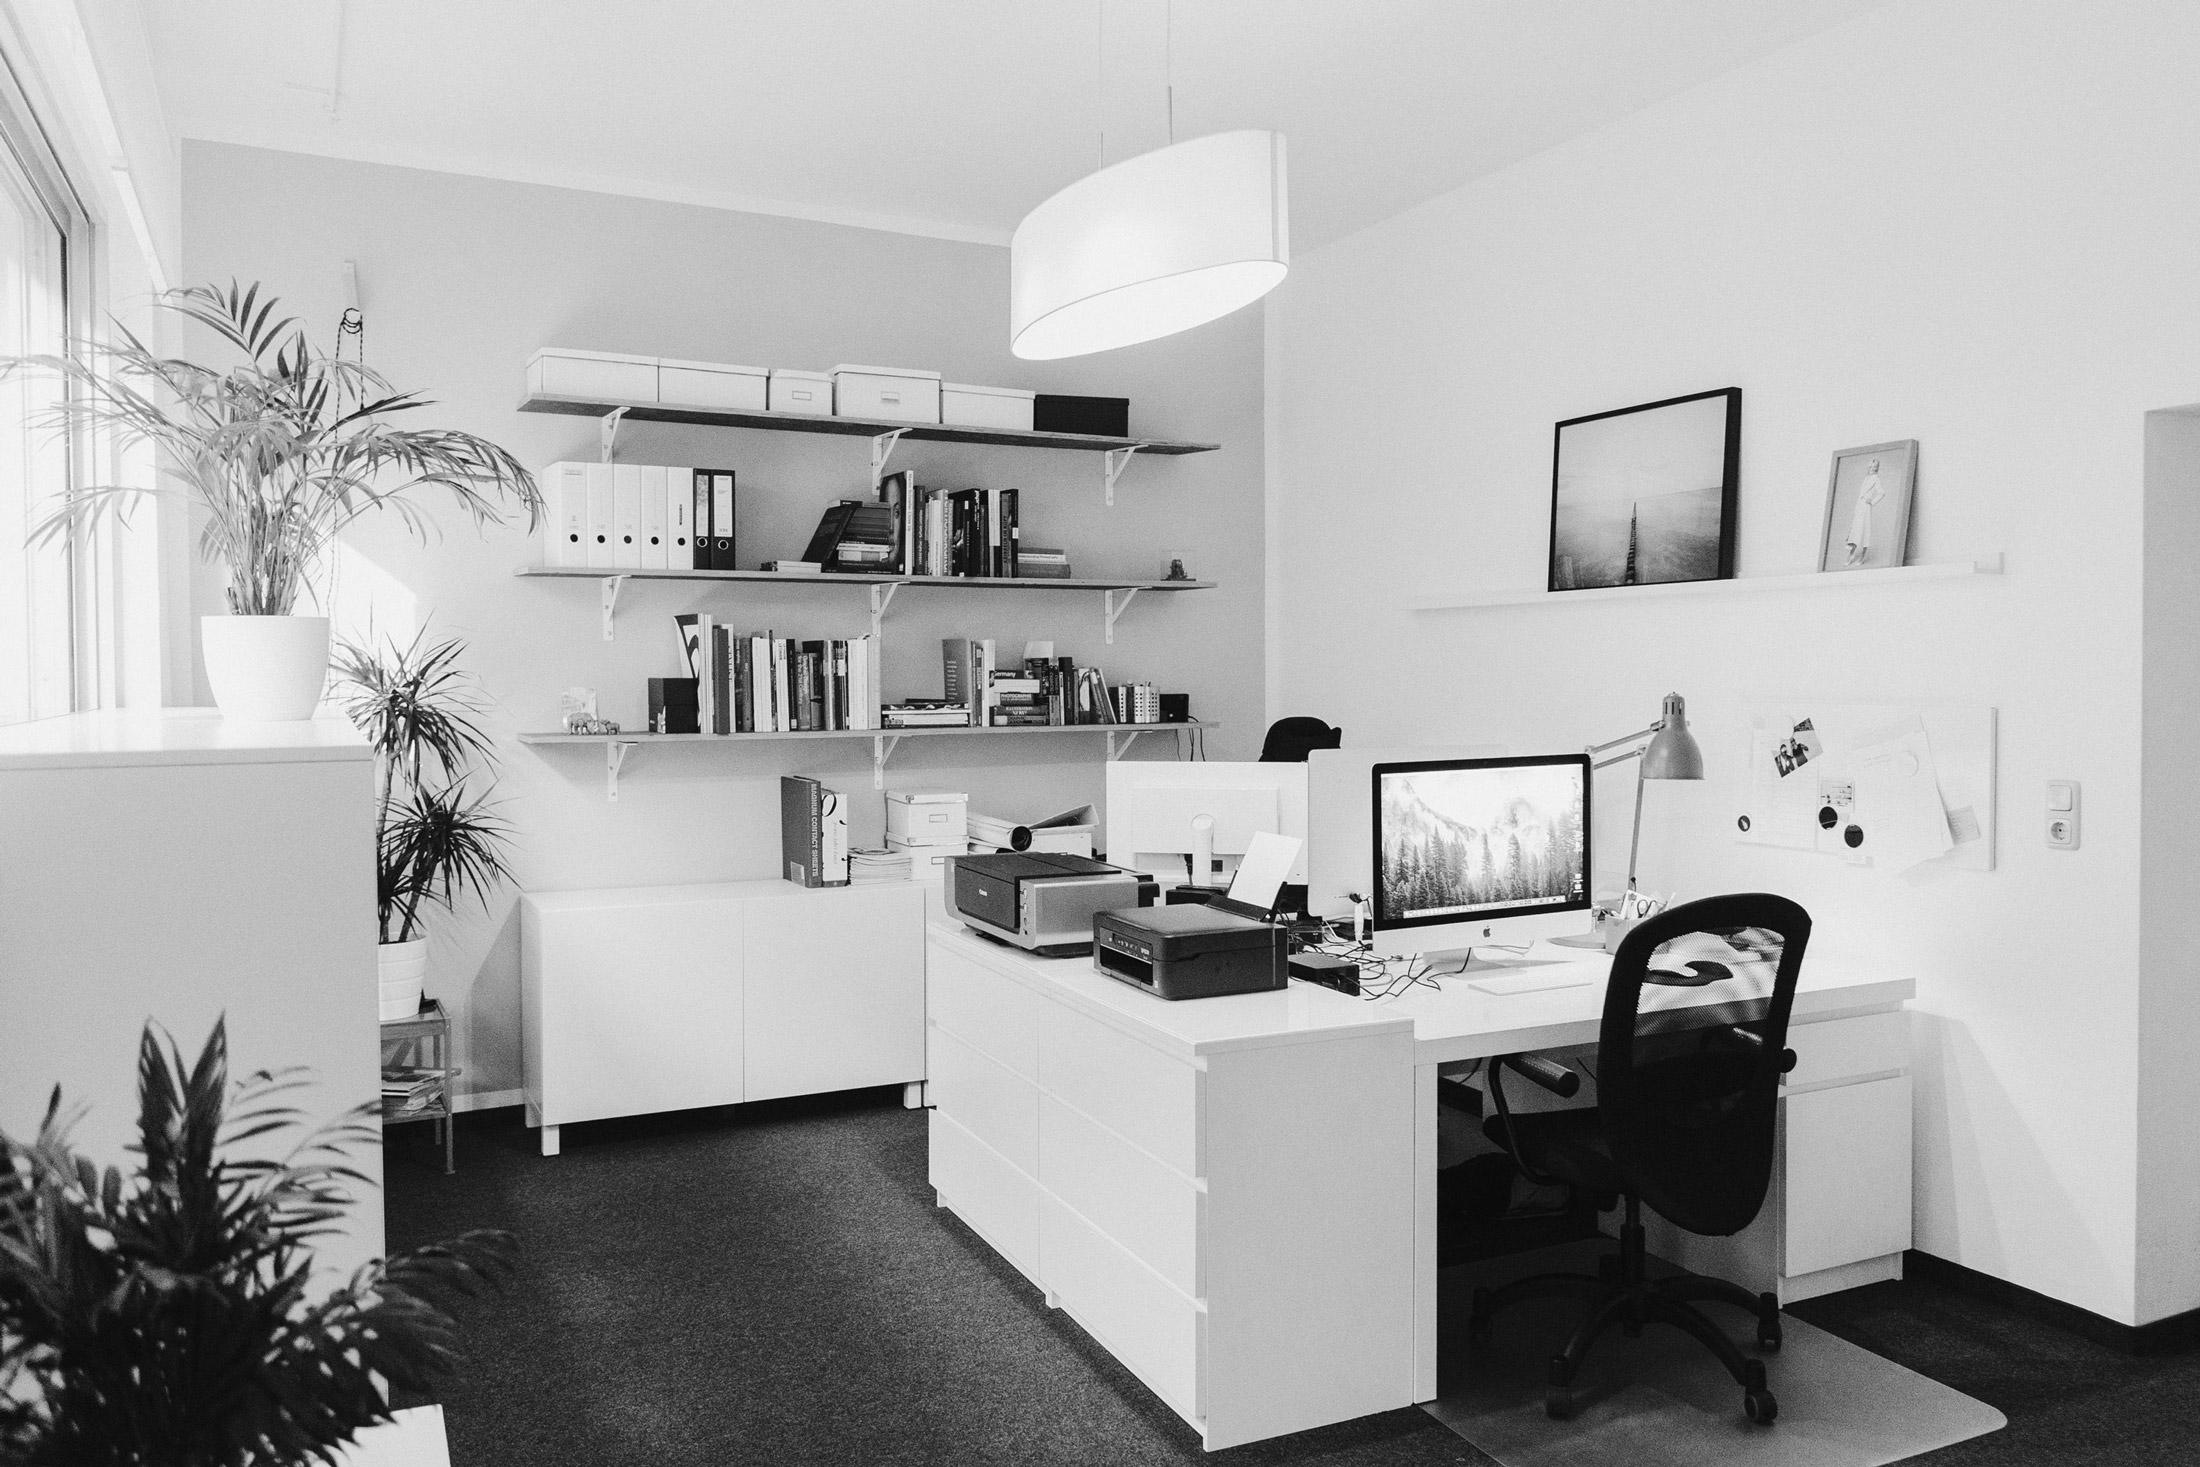 kontakt neue bilder b ro f r fotografie. Black Bedroom Furniture Sets. Home Design Ideas